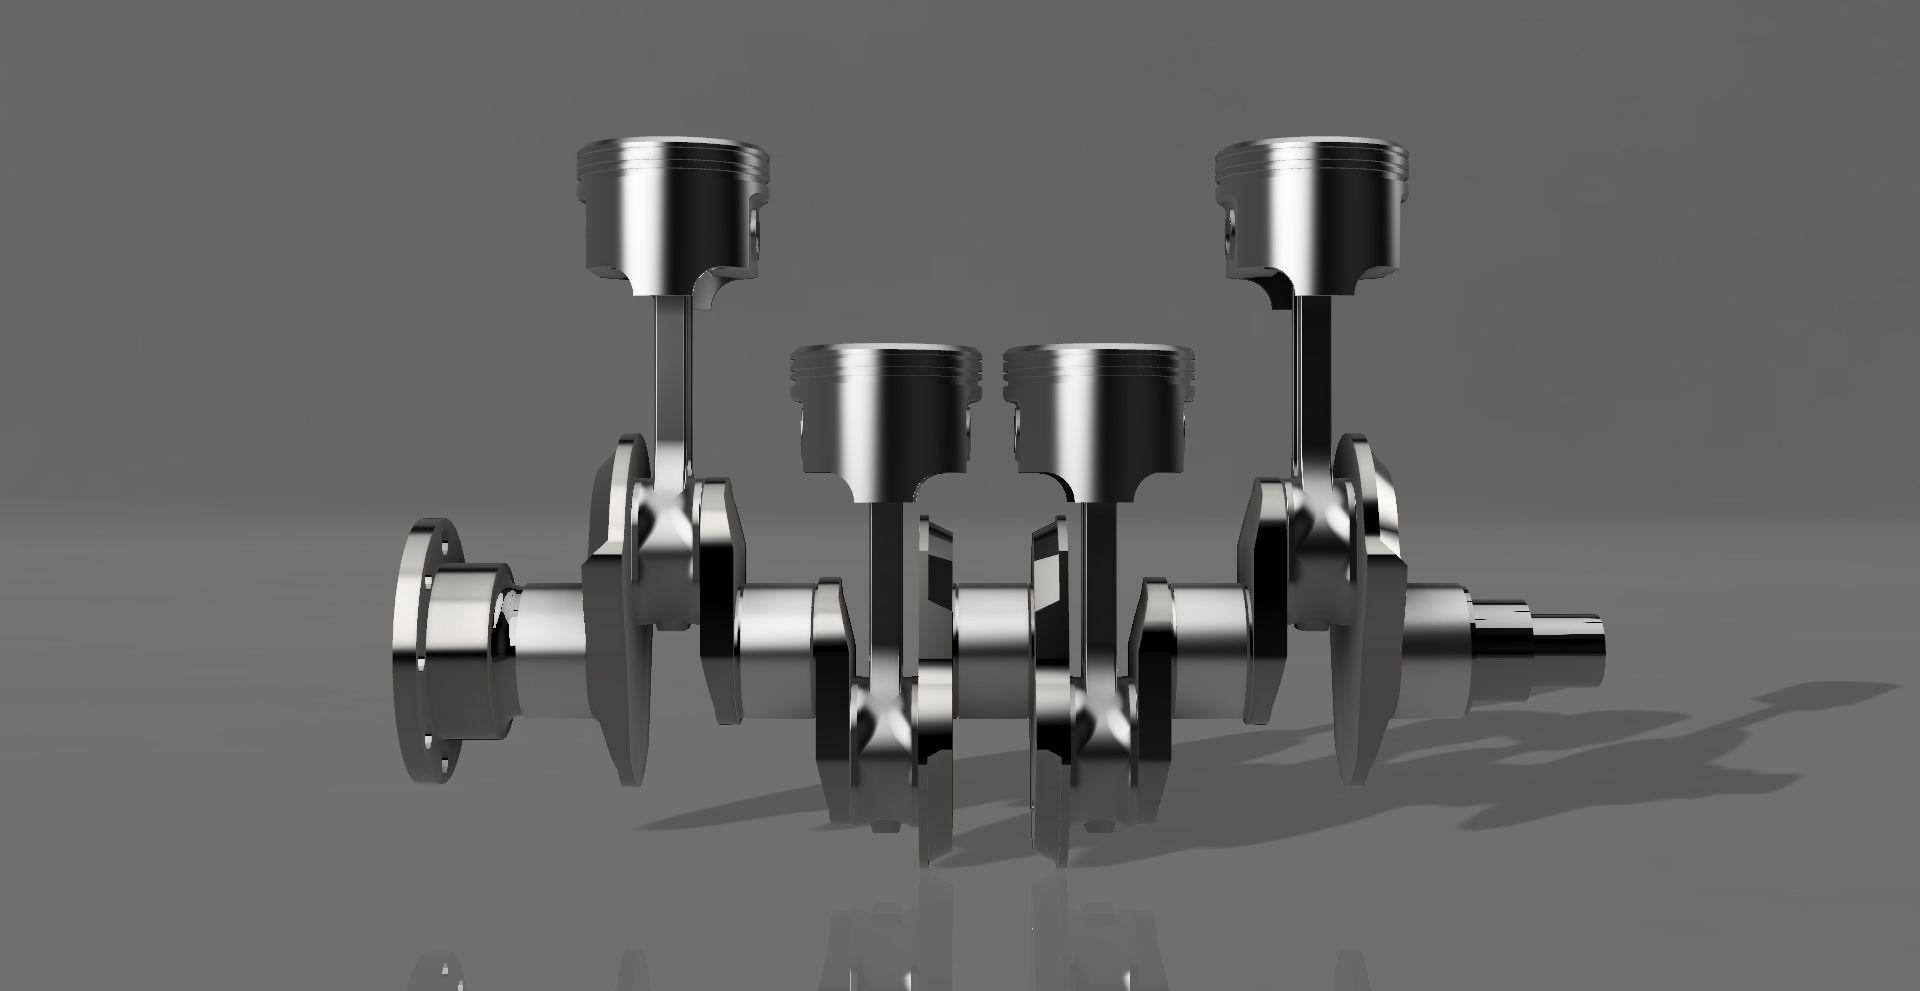 Engine-model-v12-1-3500-3500